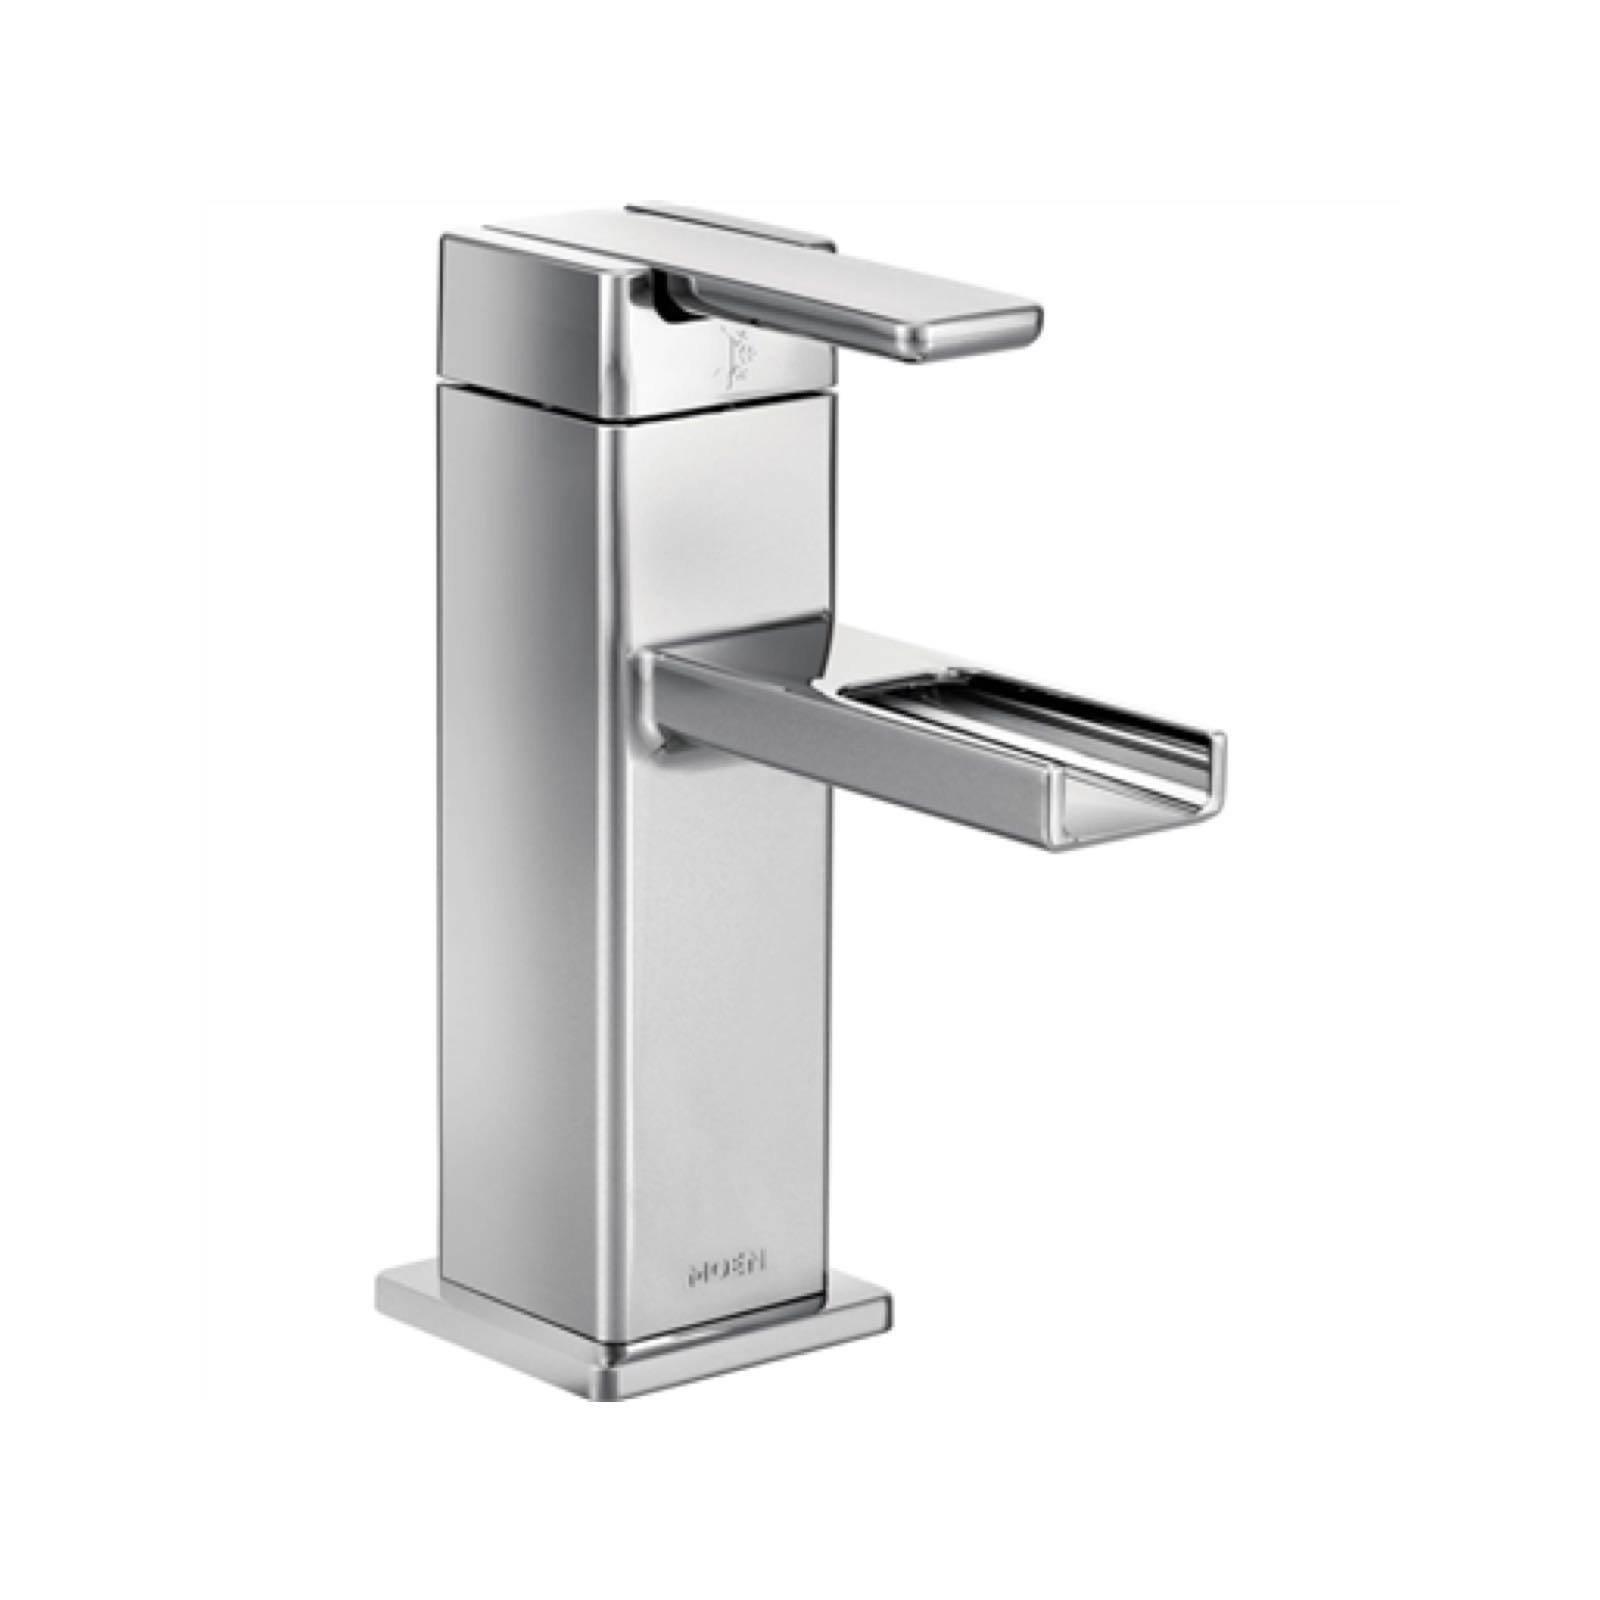 Moen 90 Degree Single Hole Bathroom Faucet by Hausera - Dwell